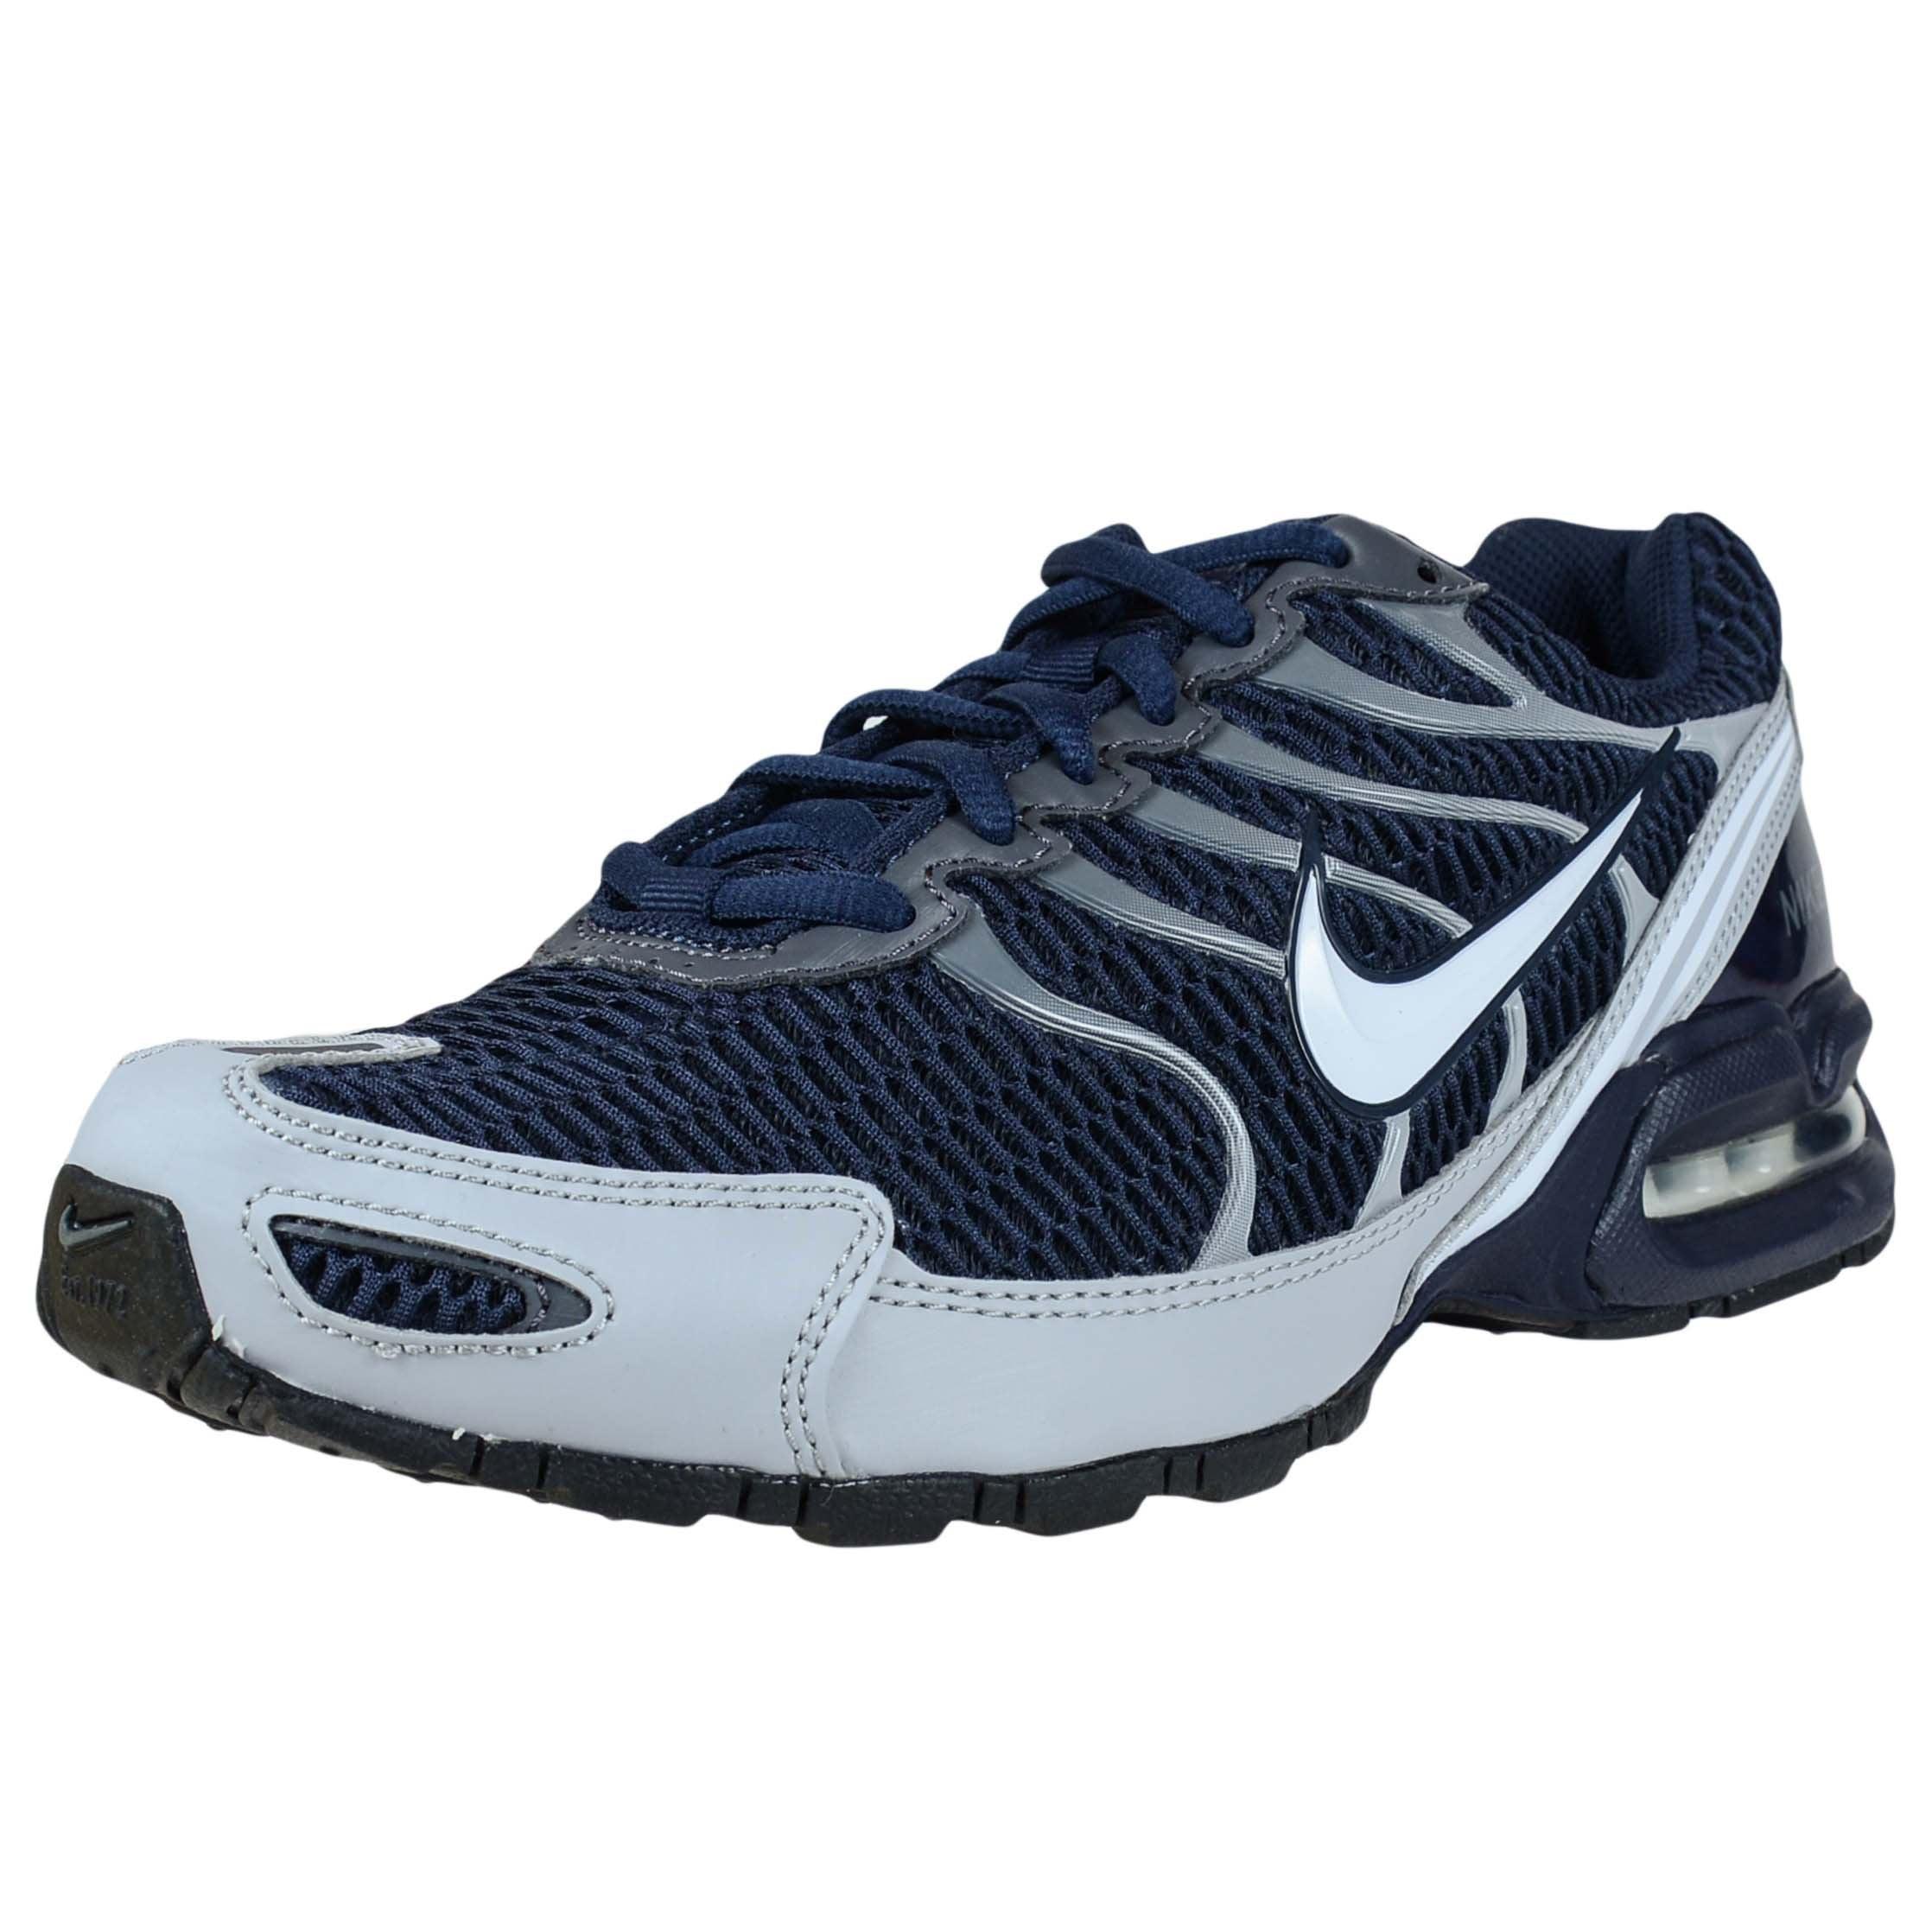 Nike Men's Air Monarch IV (4E) Training Shoe (Black / Bla...